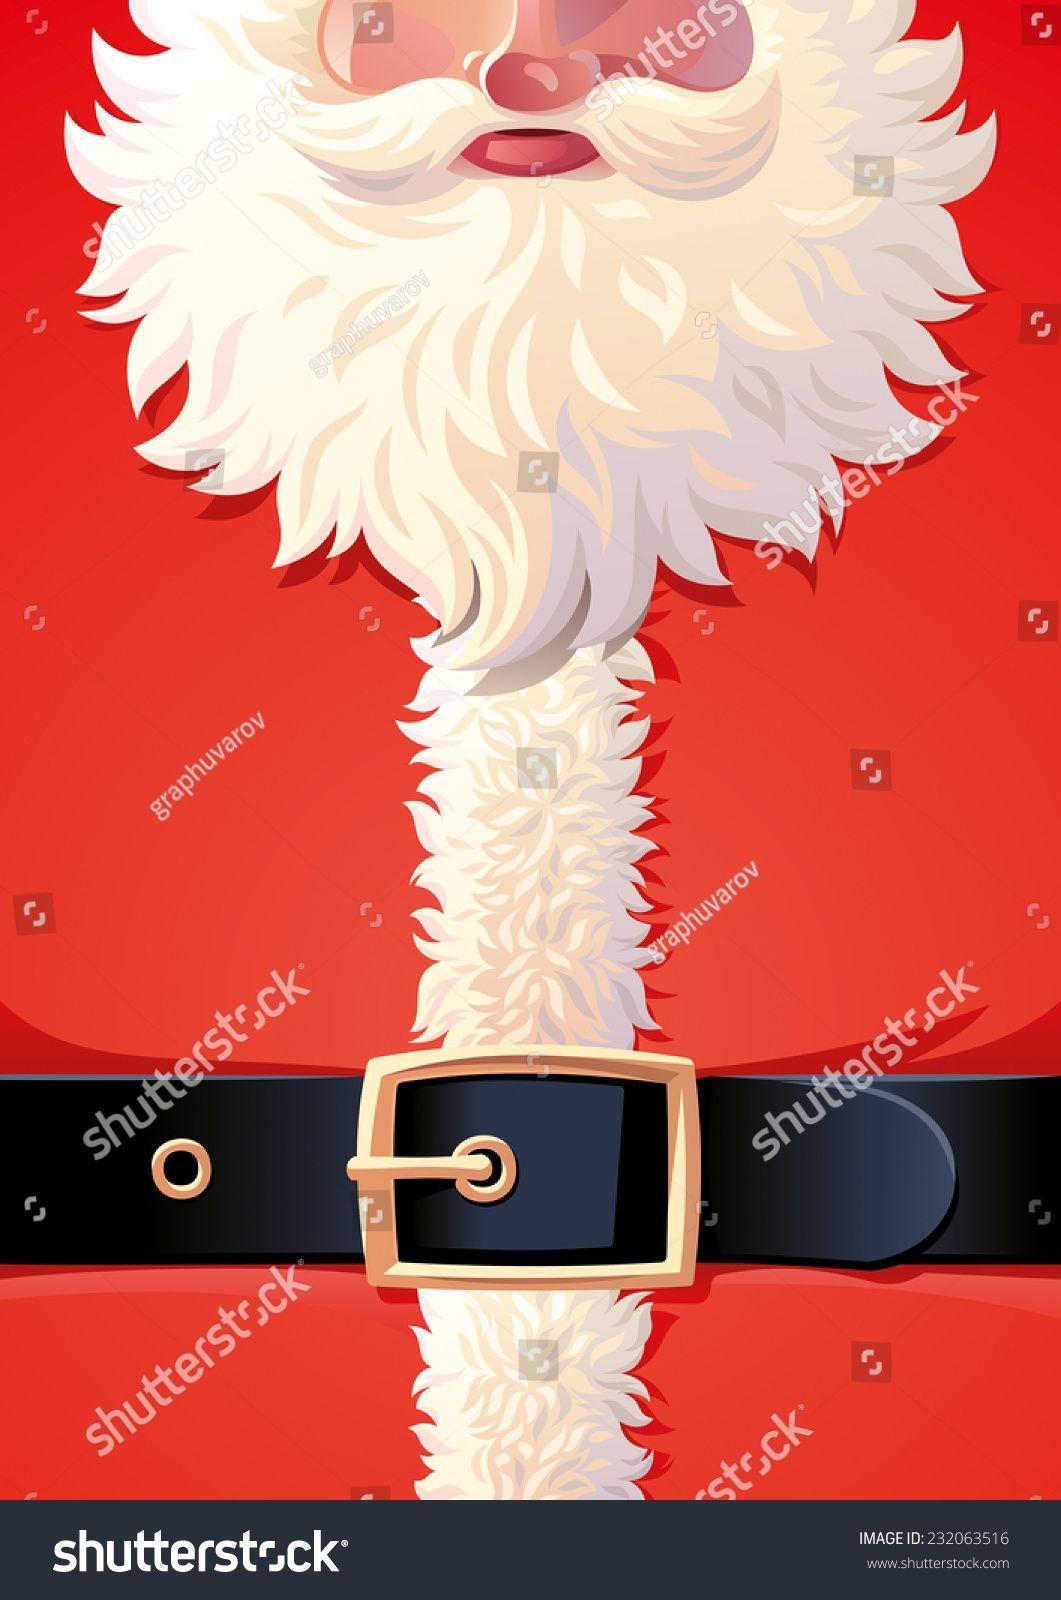 Background of Santa Claus coat Vector illustration, Free